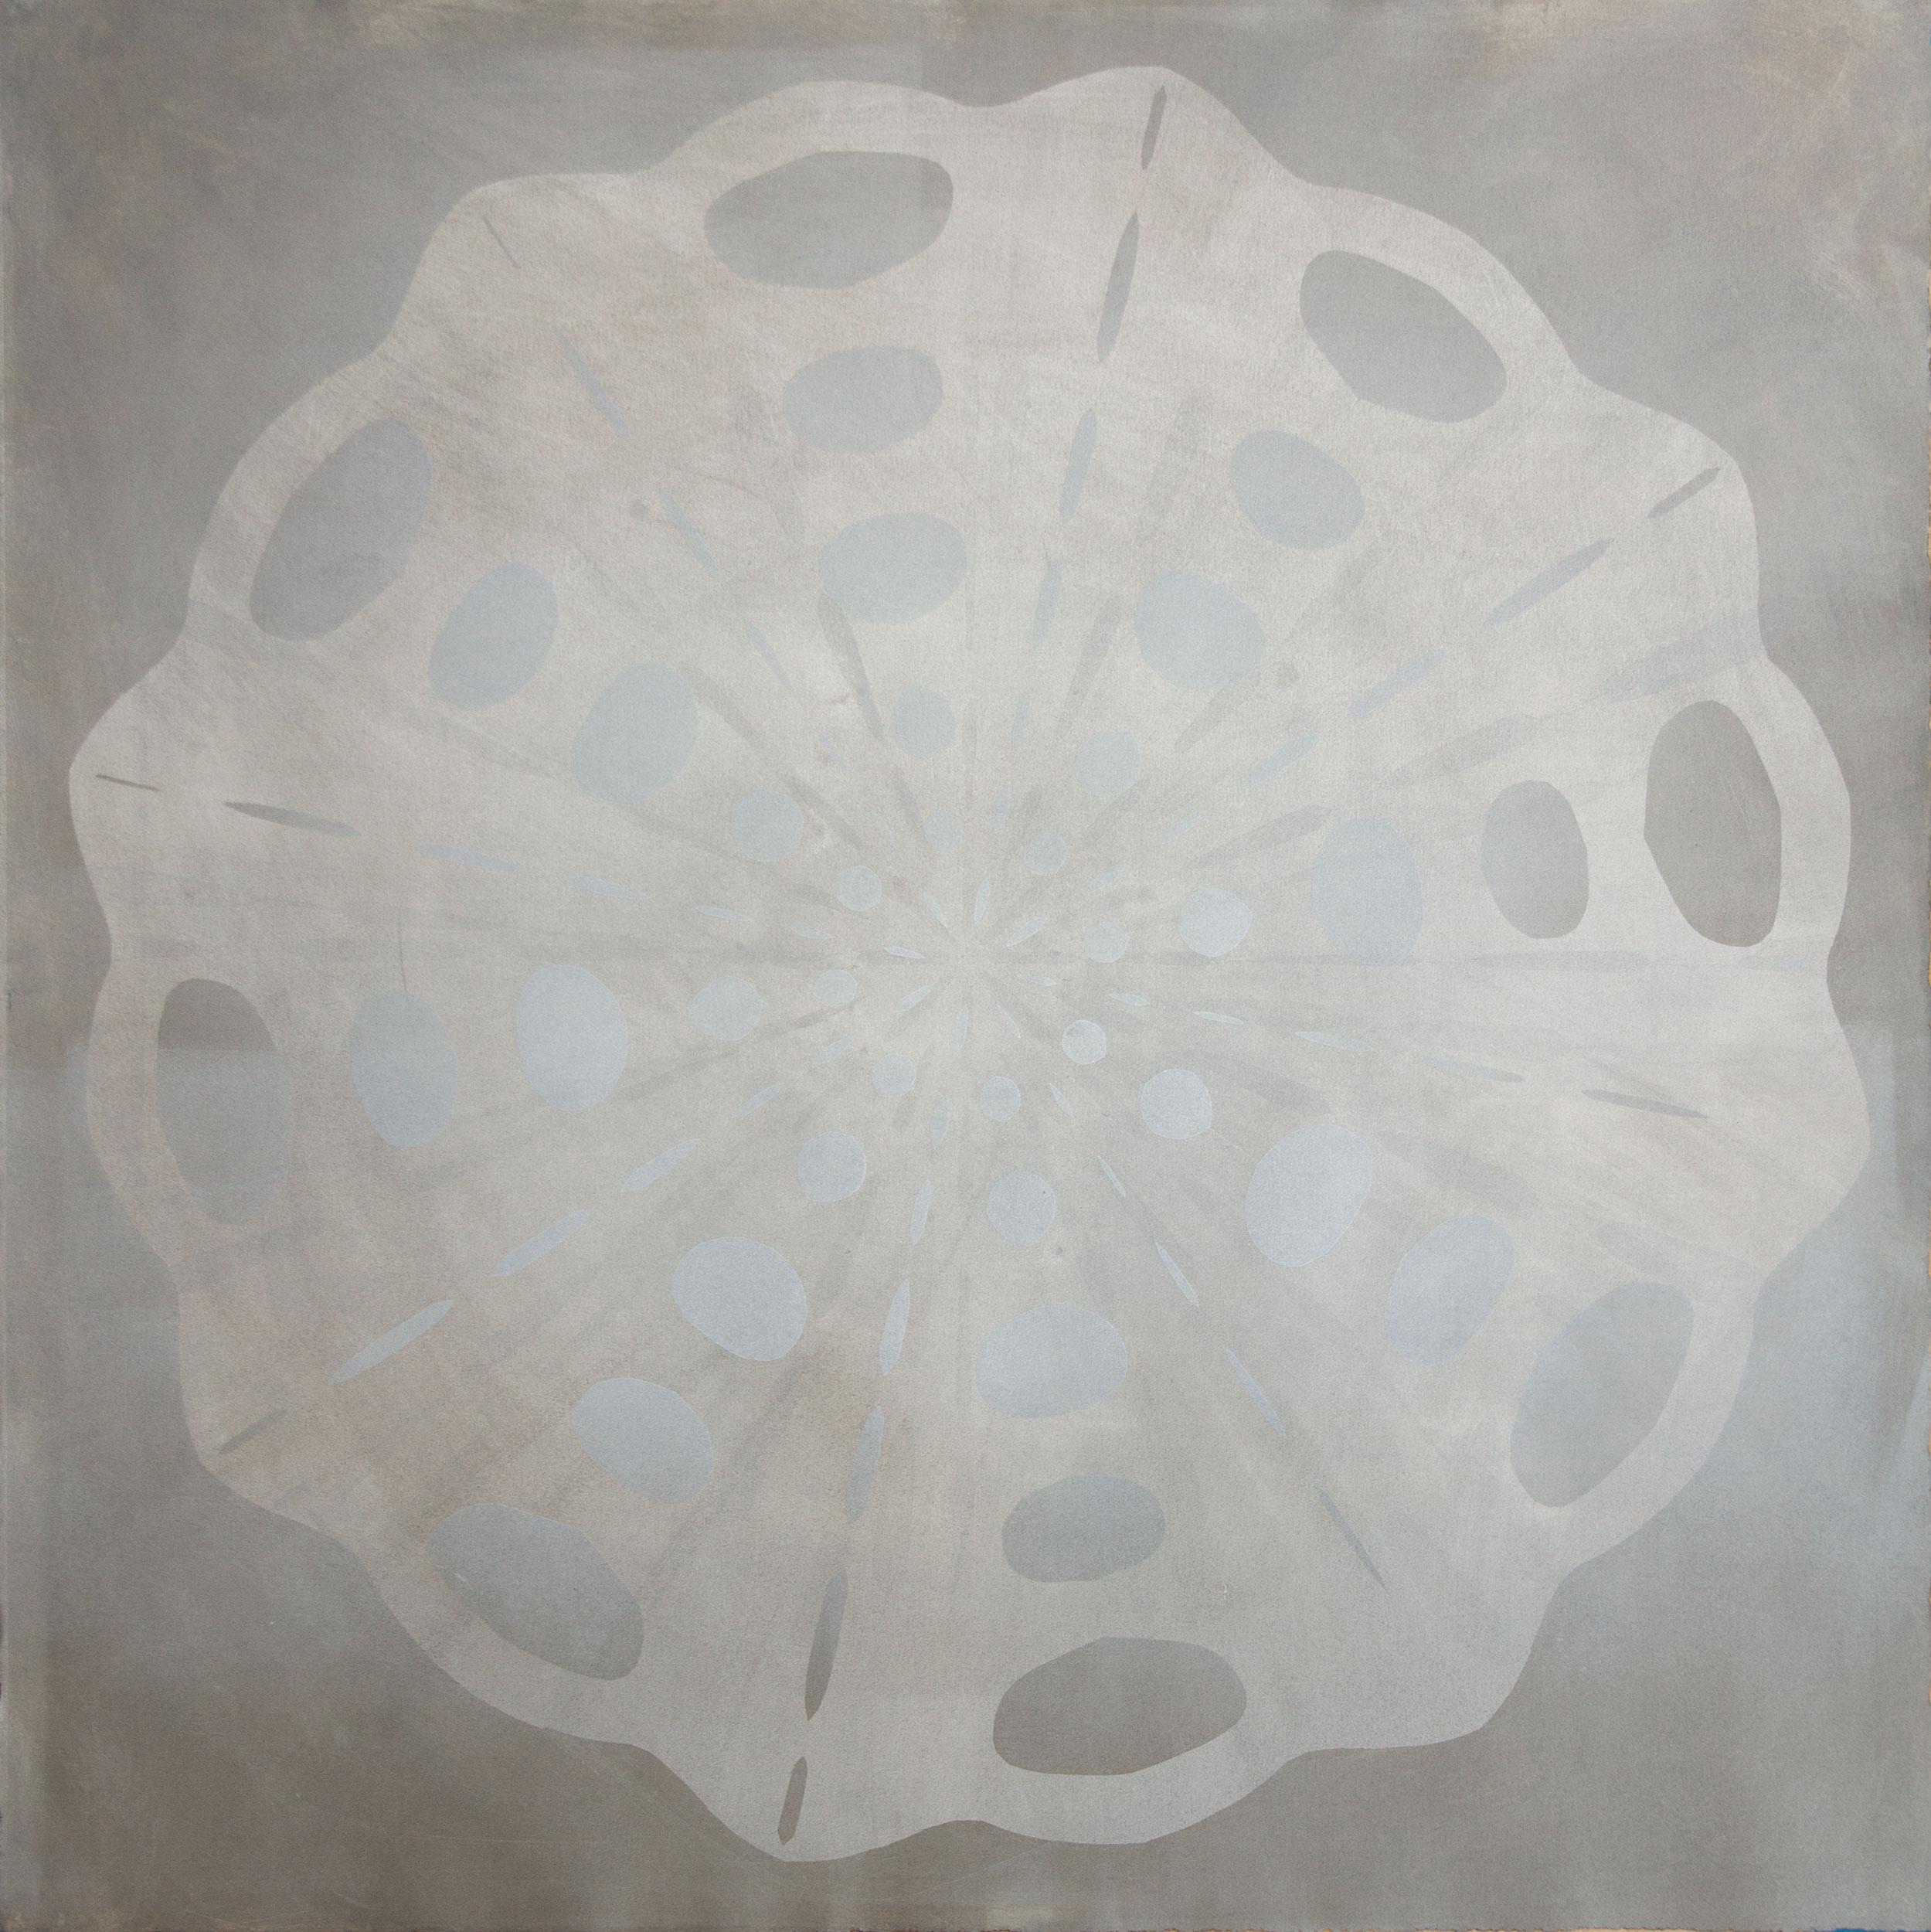 radial symmetry 13